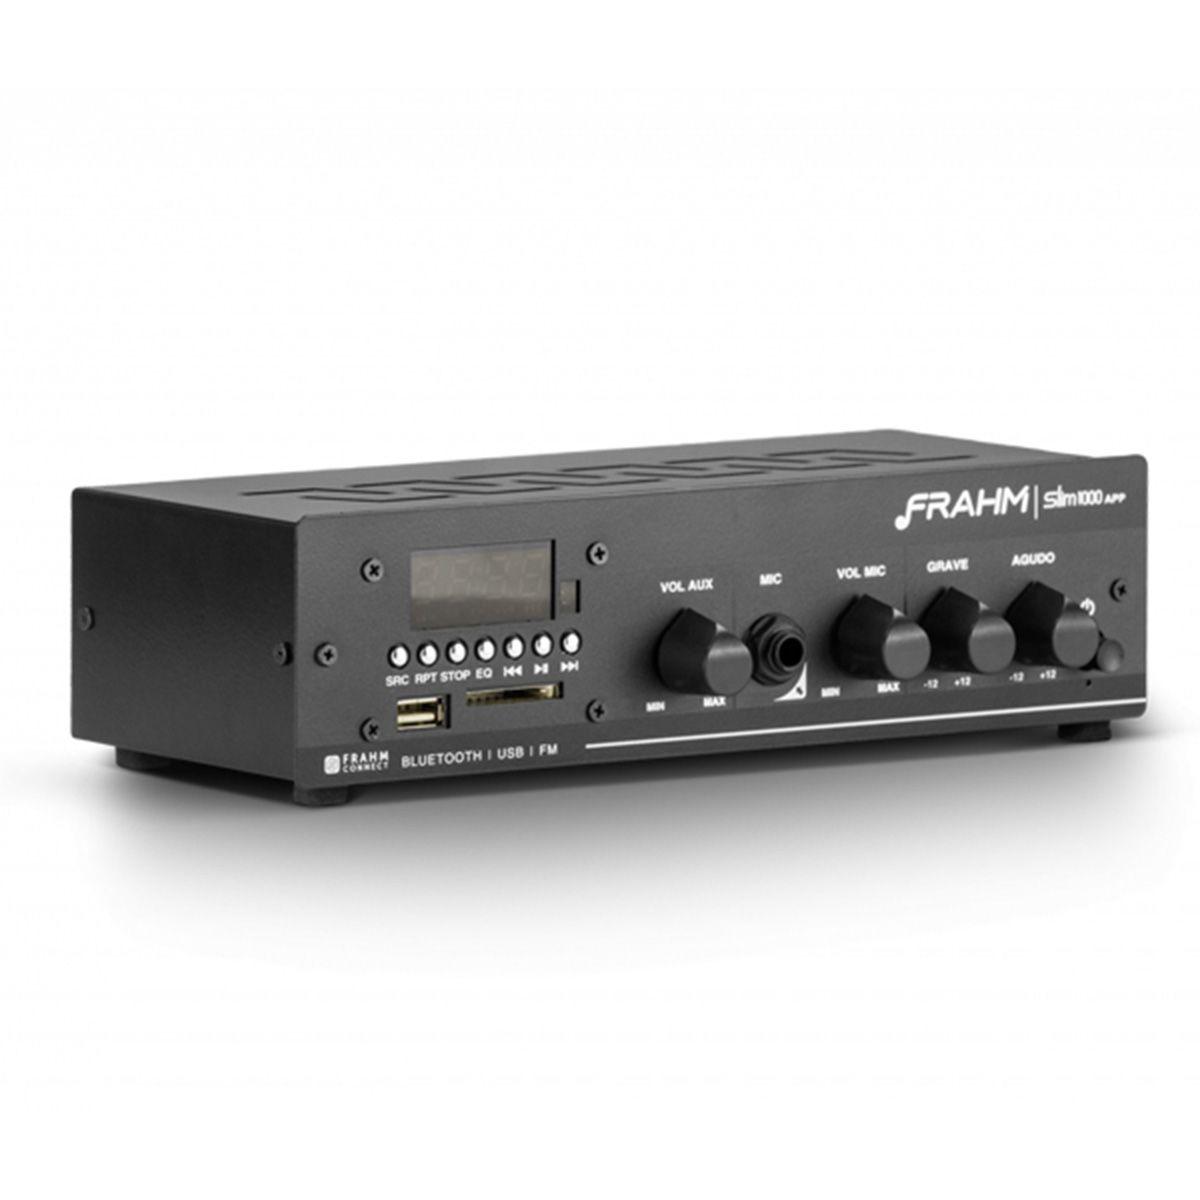 Amplificador Slim 1000 APP - Frahm